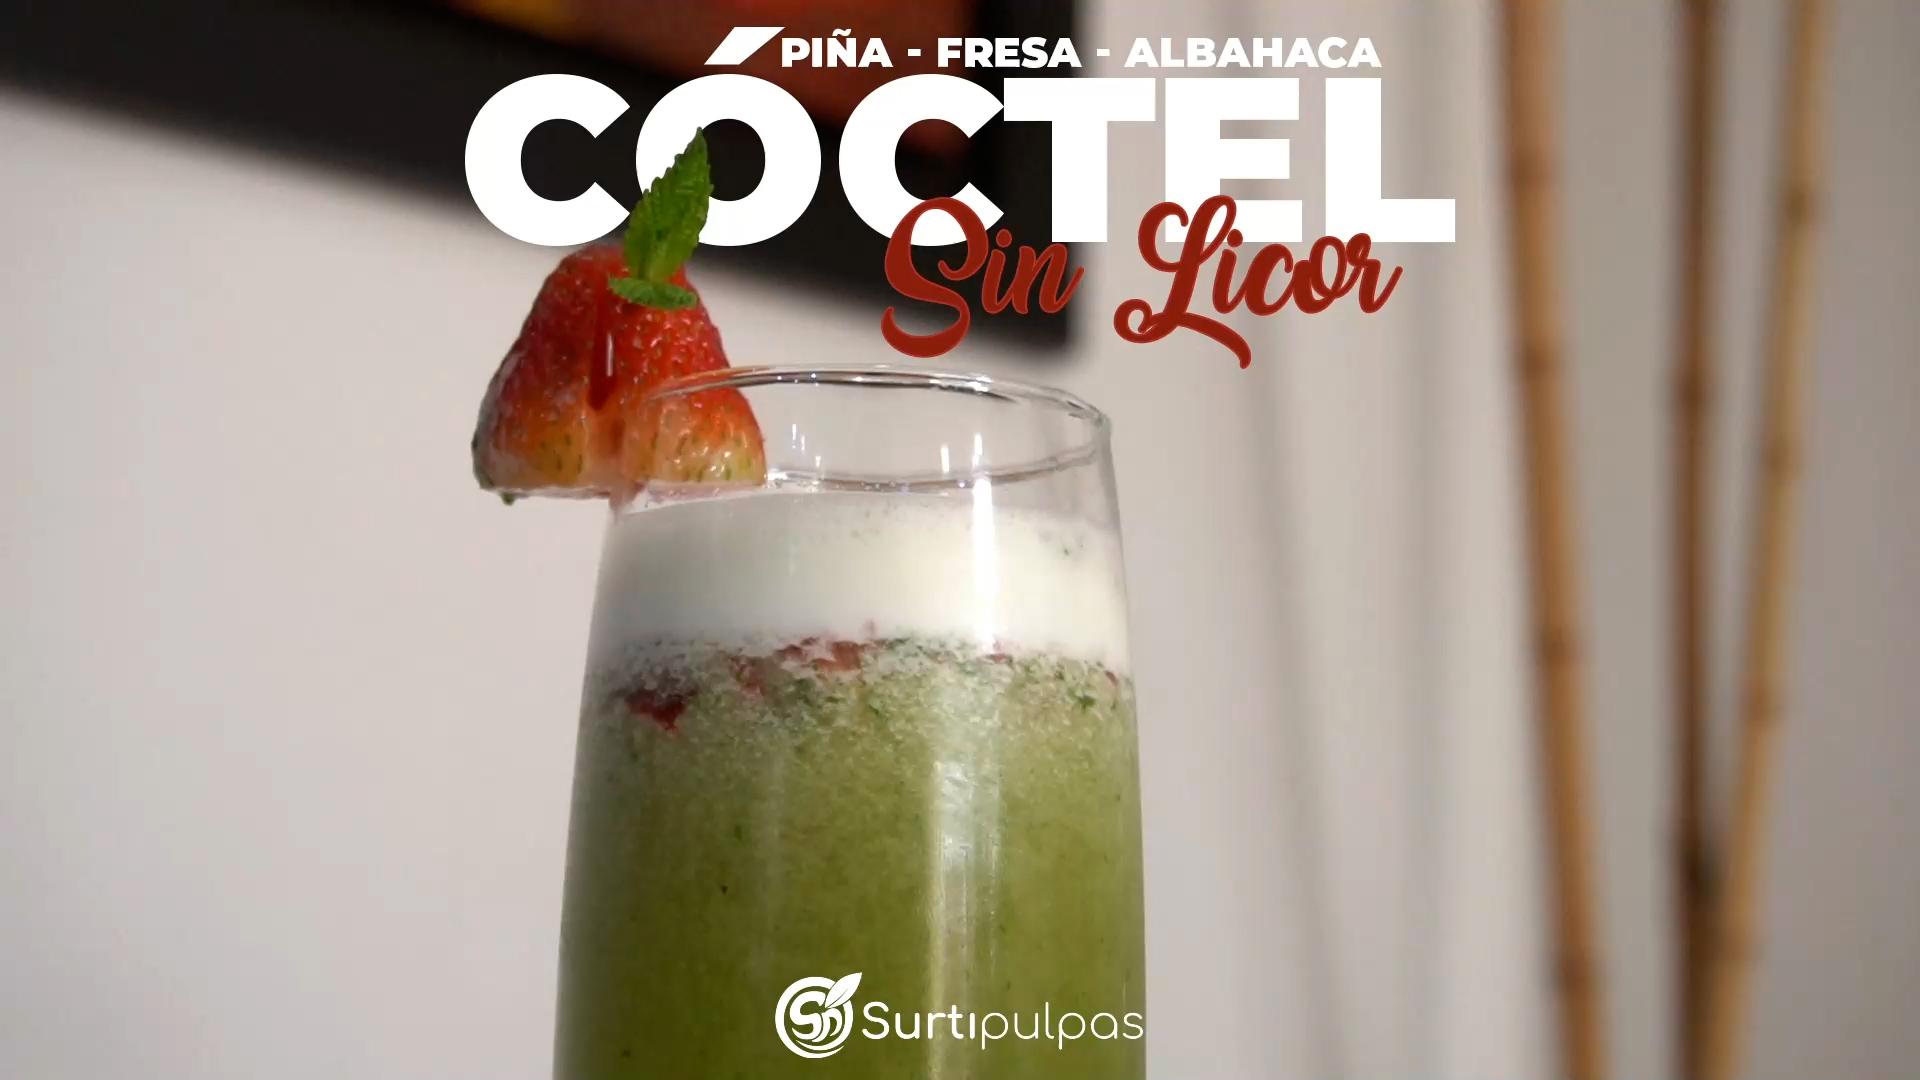 Cóctel sin Licor de Piña, Fresa, Albahaca